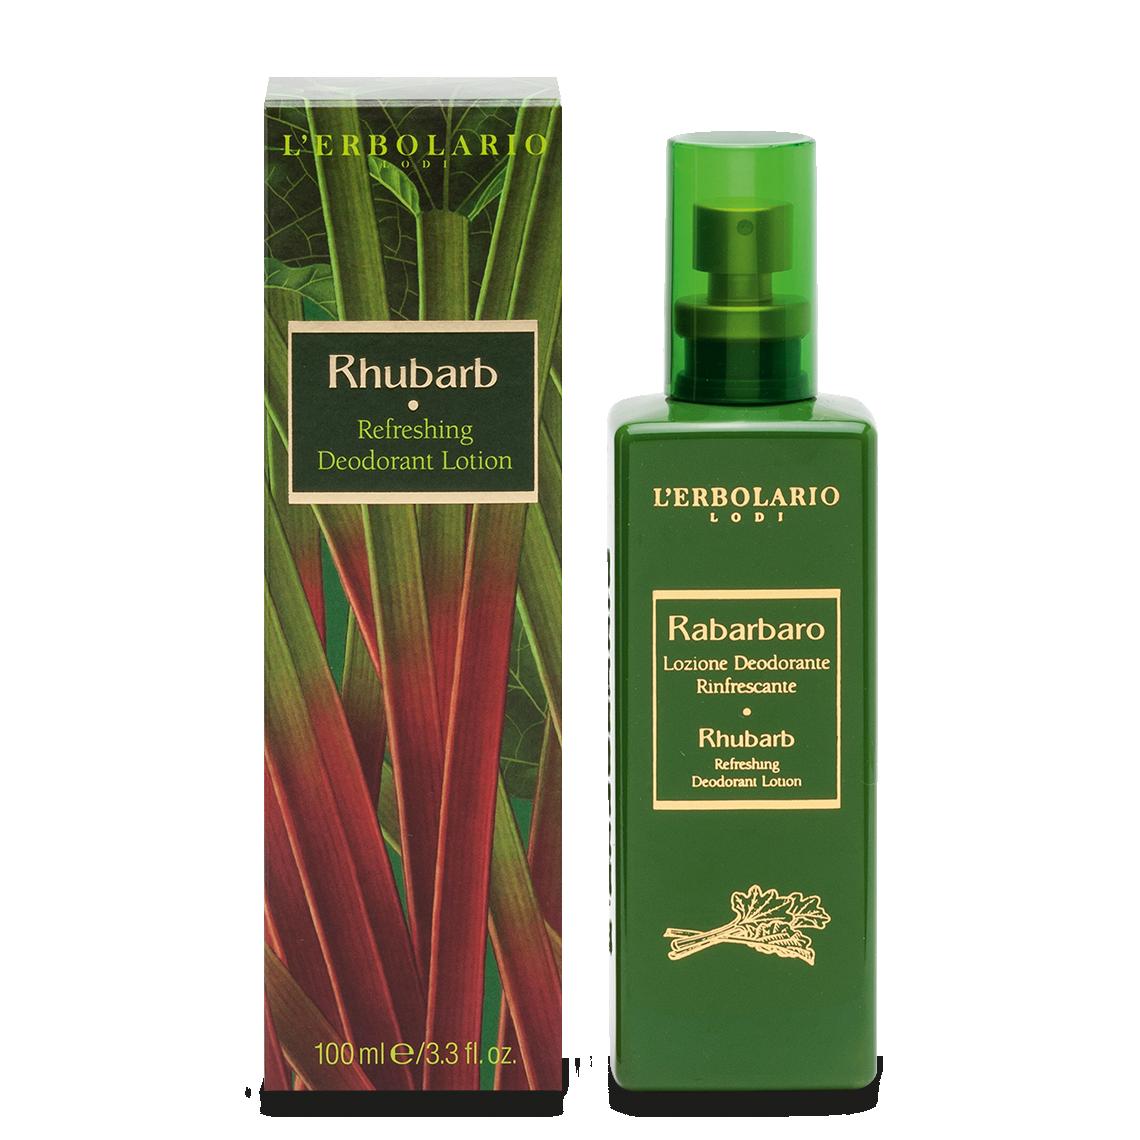 L'Erbolario, Deodorant-Lotiune Refresh Rhubarb, 100ml drmax.ro